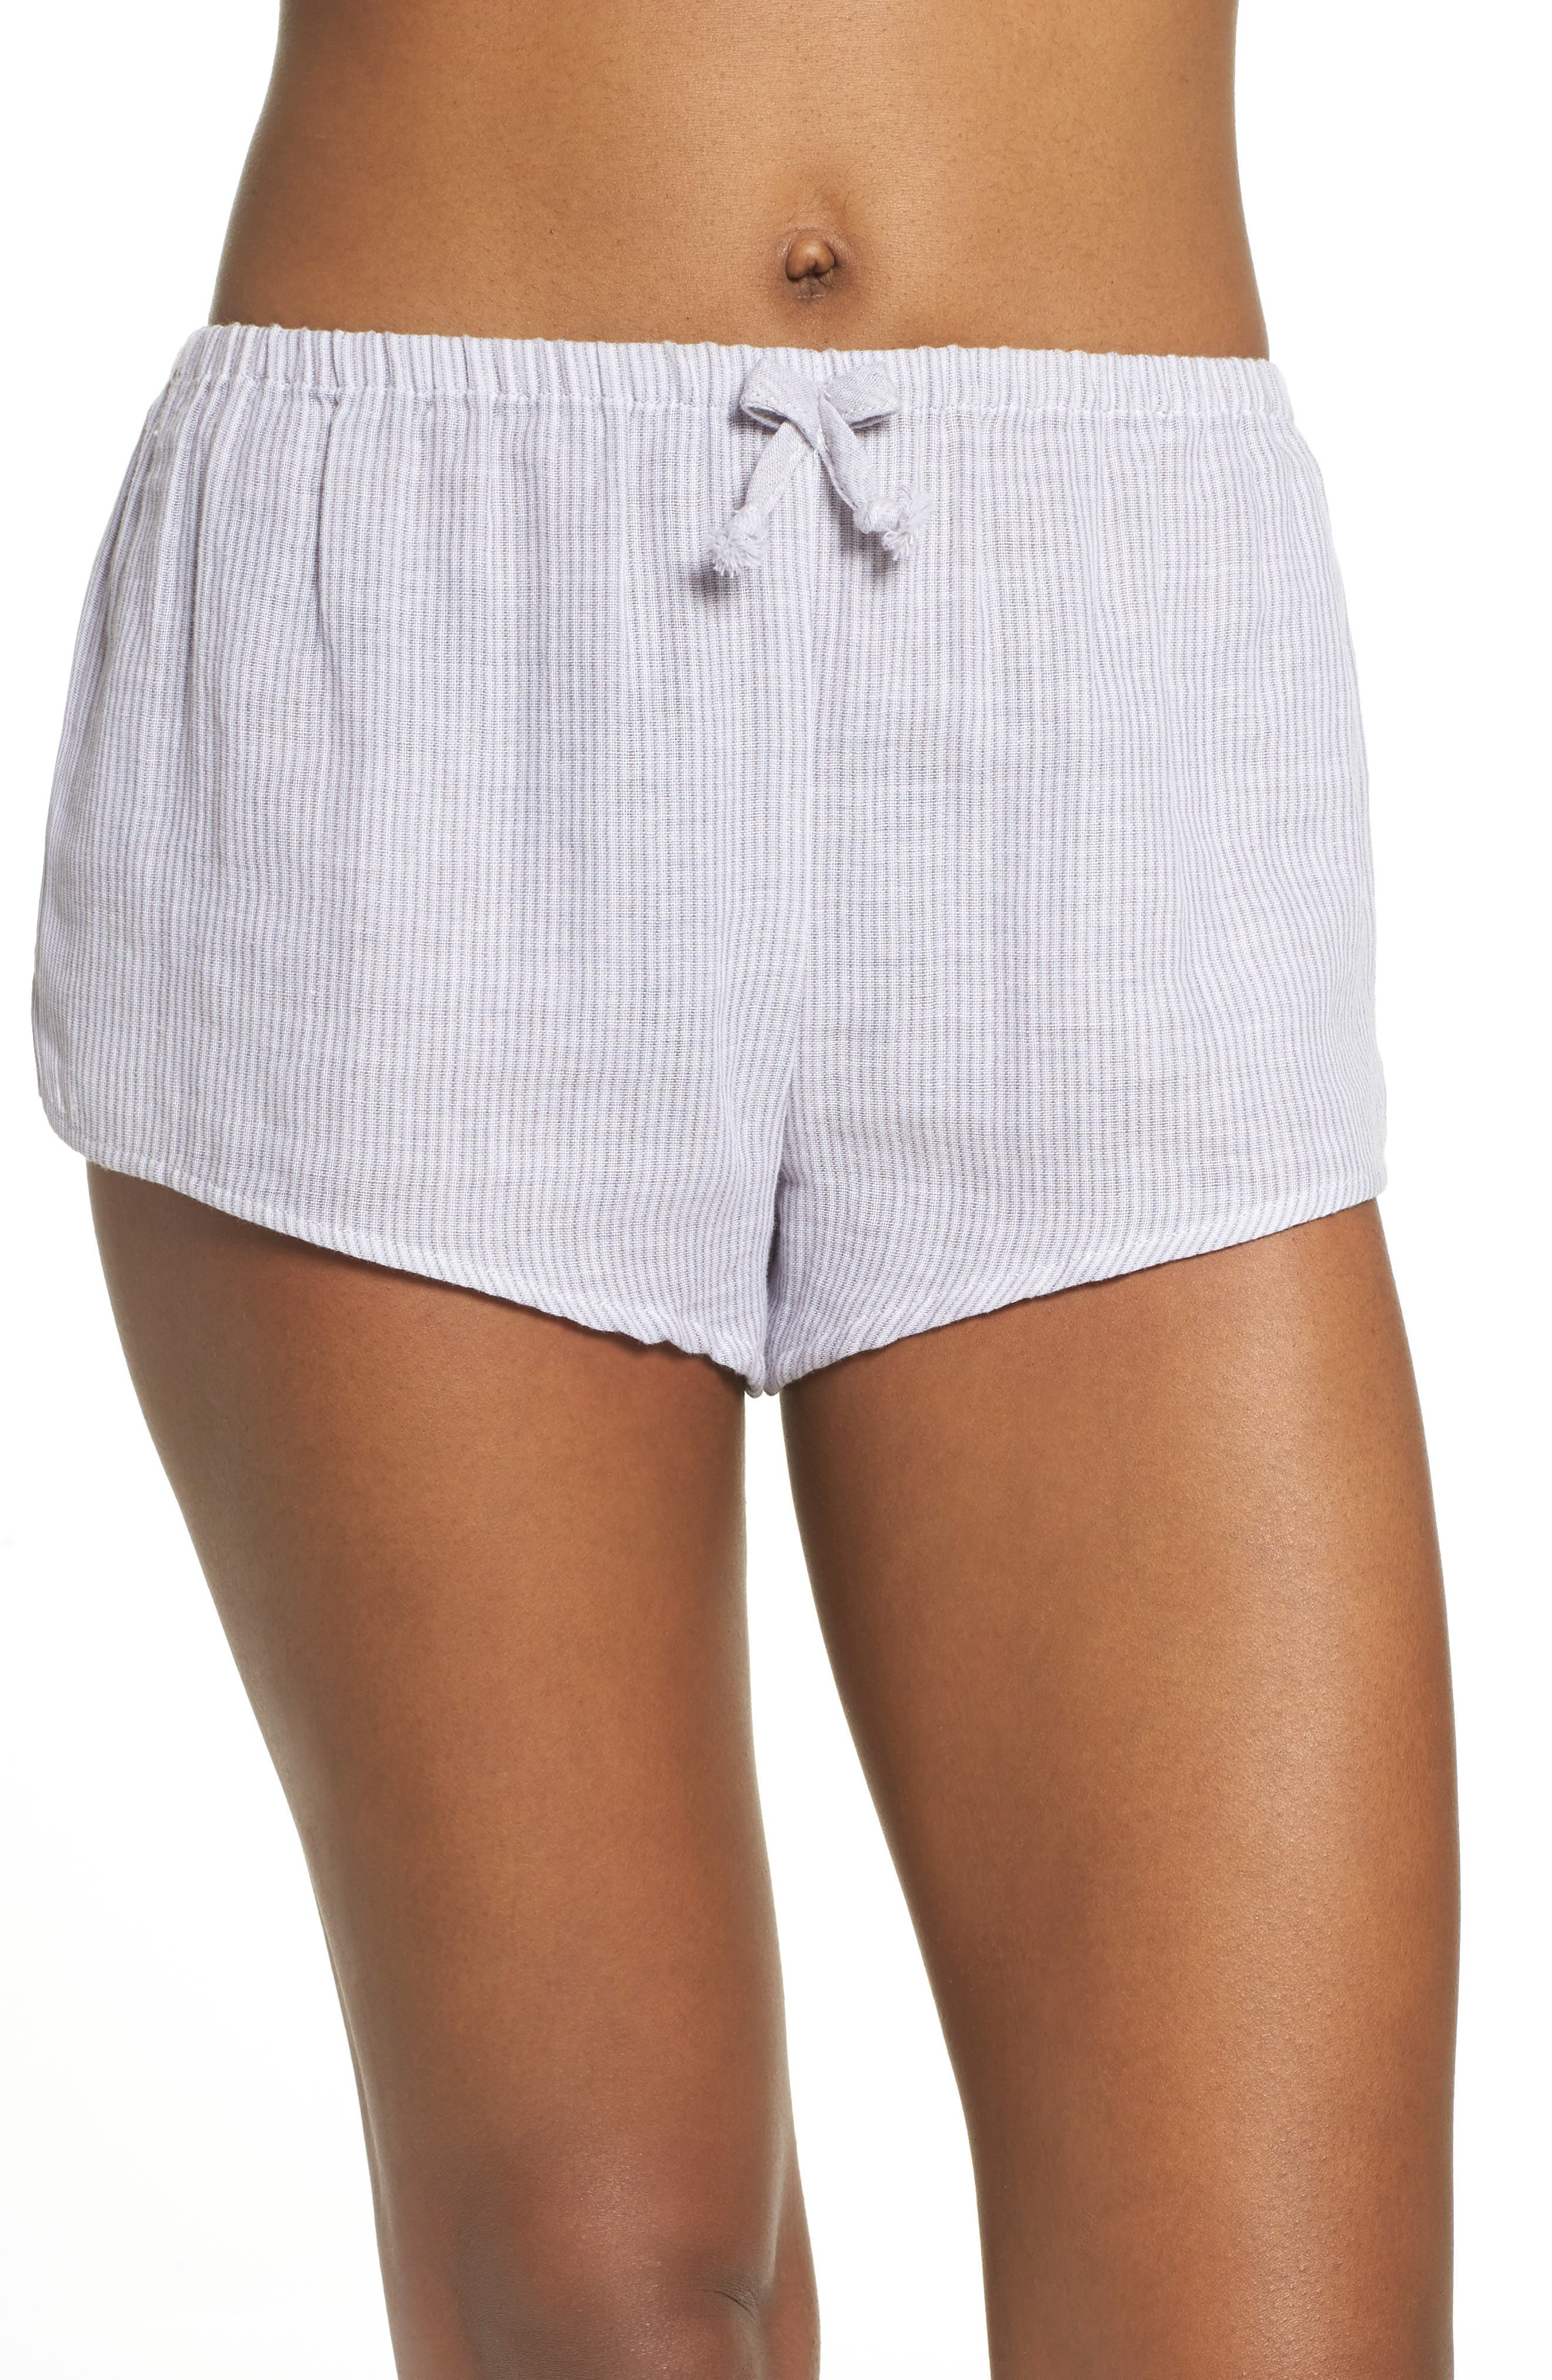 Stripe Pajama Shorts,                             Main thumbnail 1, color,                             Grey/ White